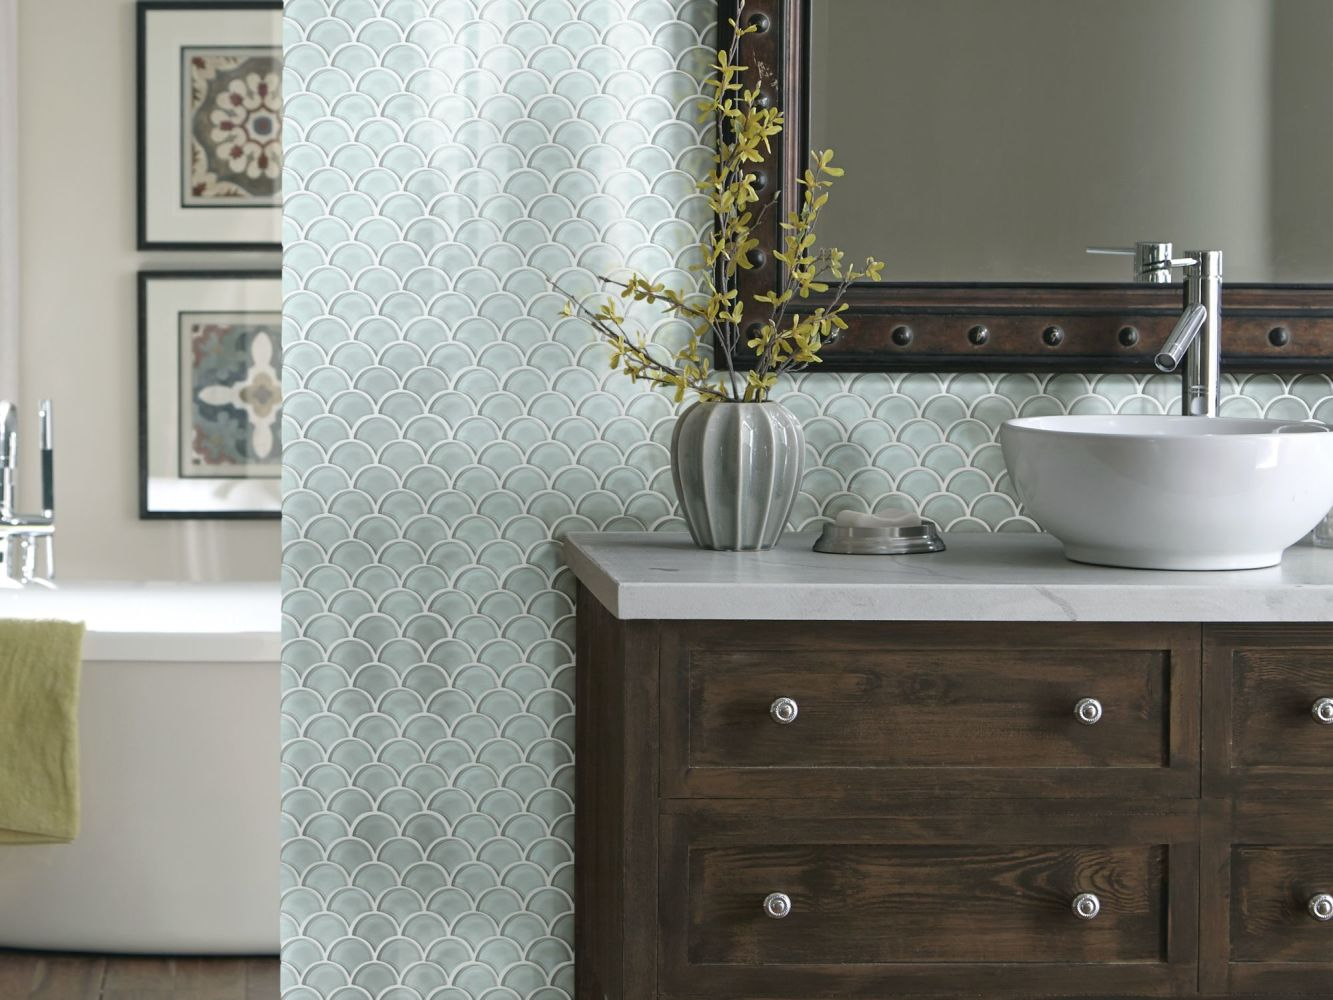 Shaw Floors Home Fn Gold Ceramic Principal Fan Glass Mosaic Cloud 00500_TG79B